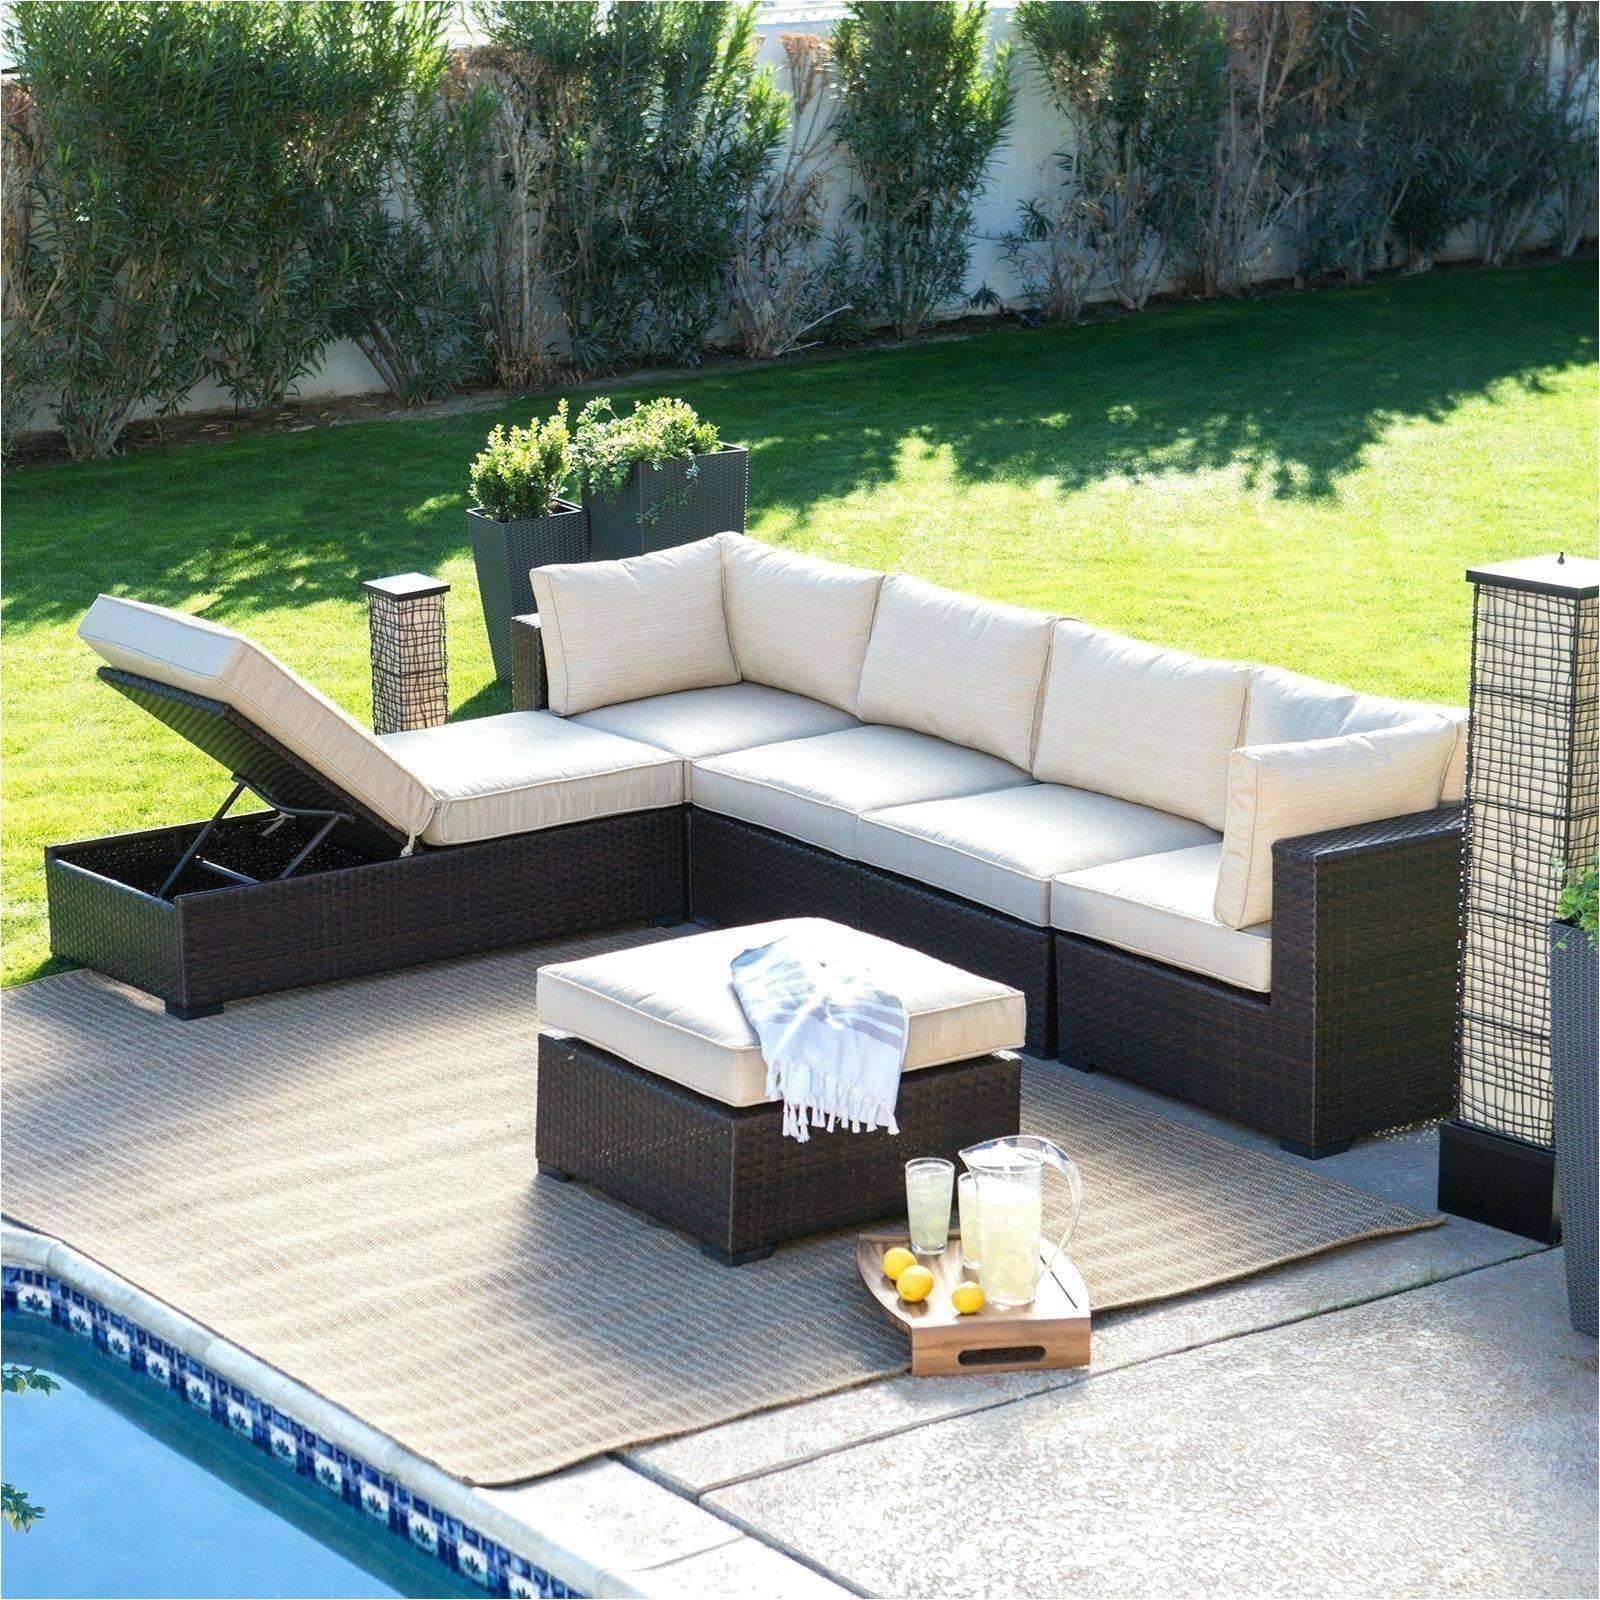 backyard misters backyard mister diy inspirational diy patio ideas a bud new wicker of backyard misters 1